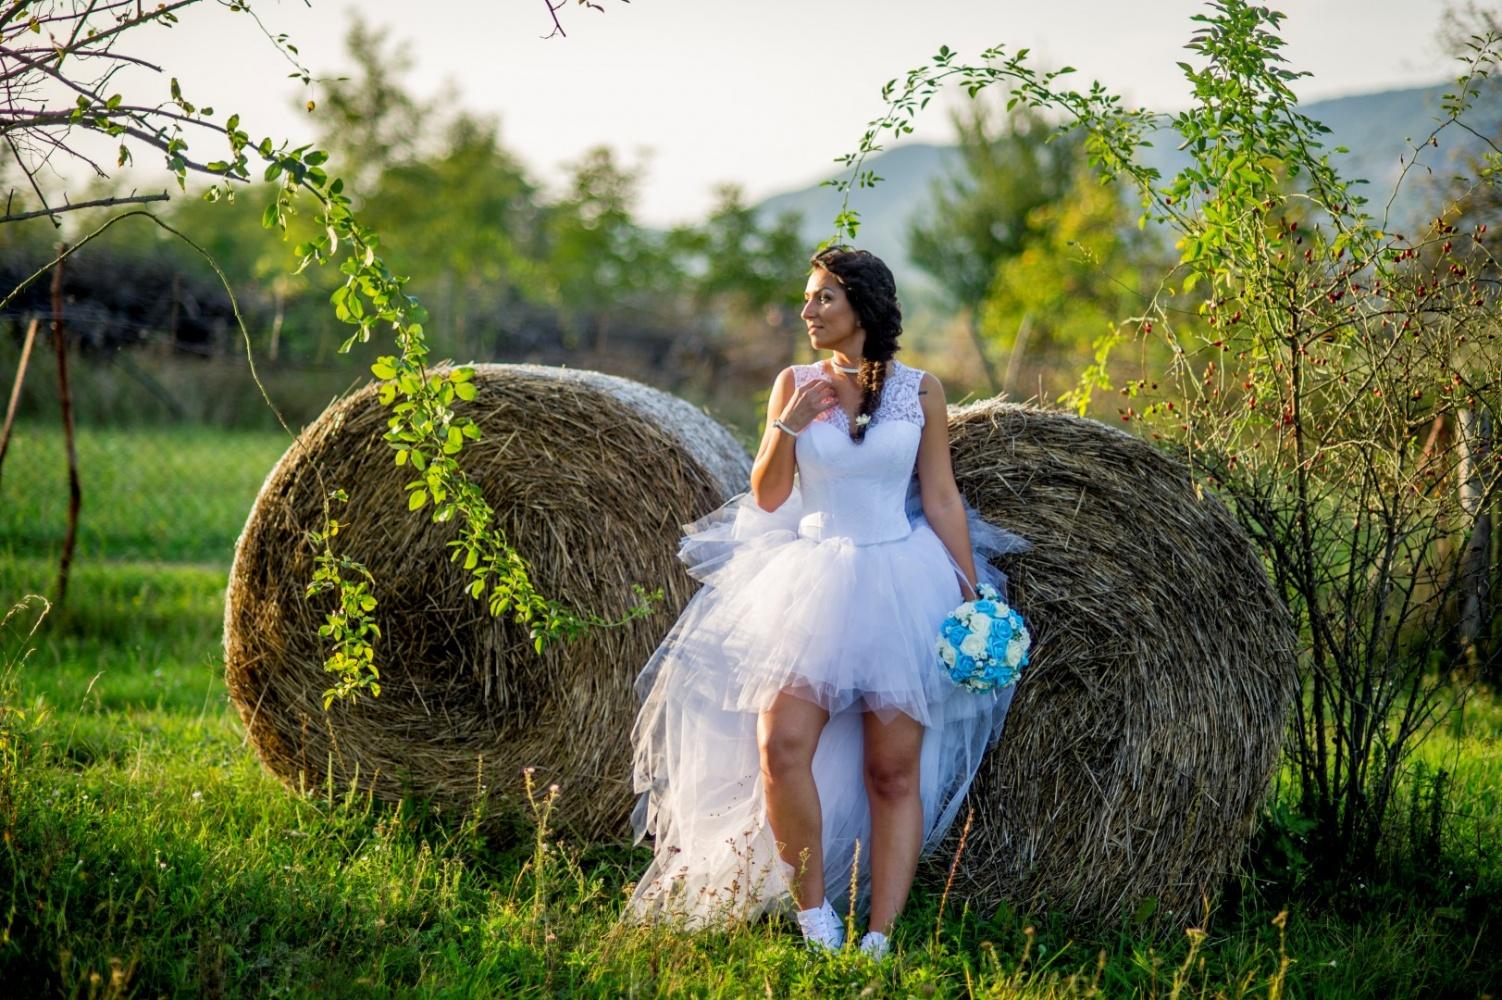 http://www.fotoz.sk/images/gallery-37/normal/svadobny-fotograf_eskuvoi-fotos_lacny-fotograf_fotograf-na-svadbu_juraj-zsok_fotograf-nitra_fotograf-galanta_juraj-zsok060.jpg